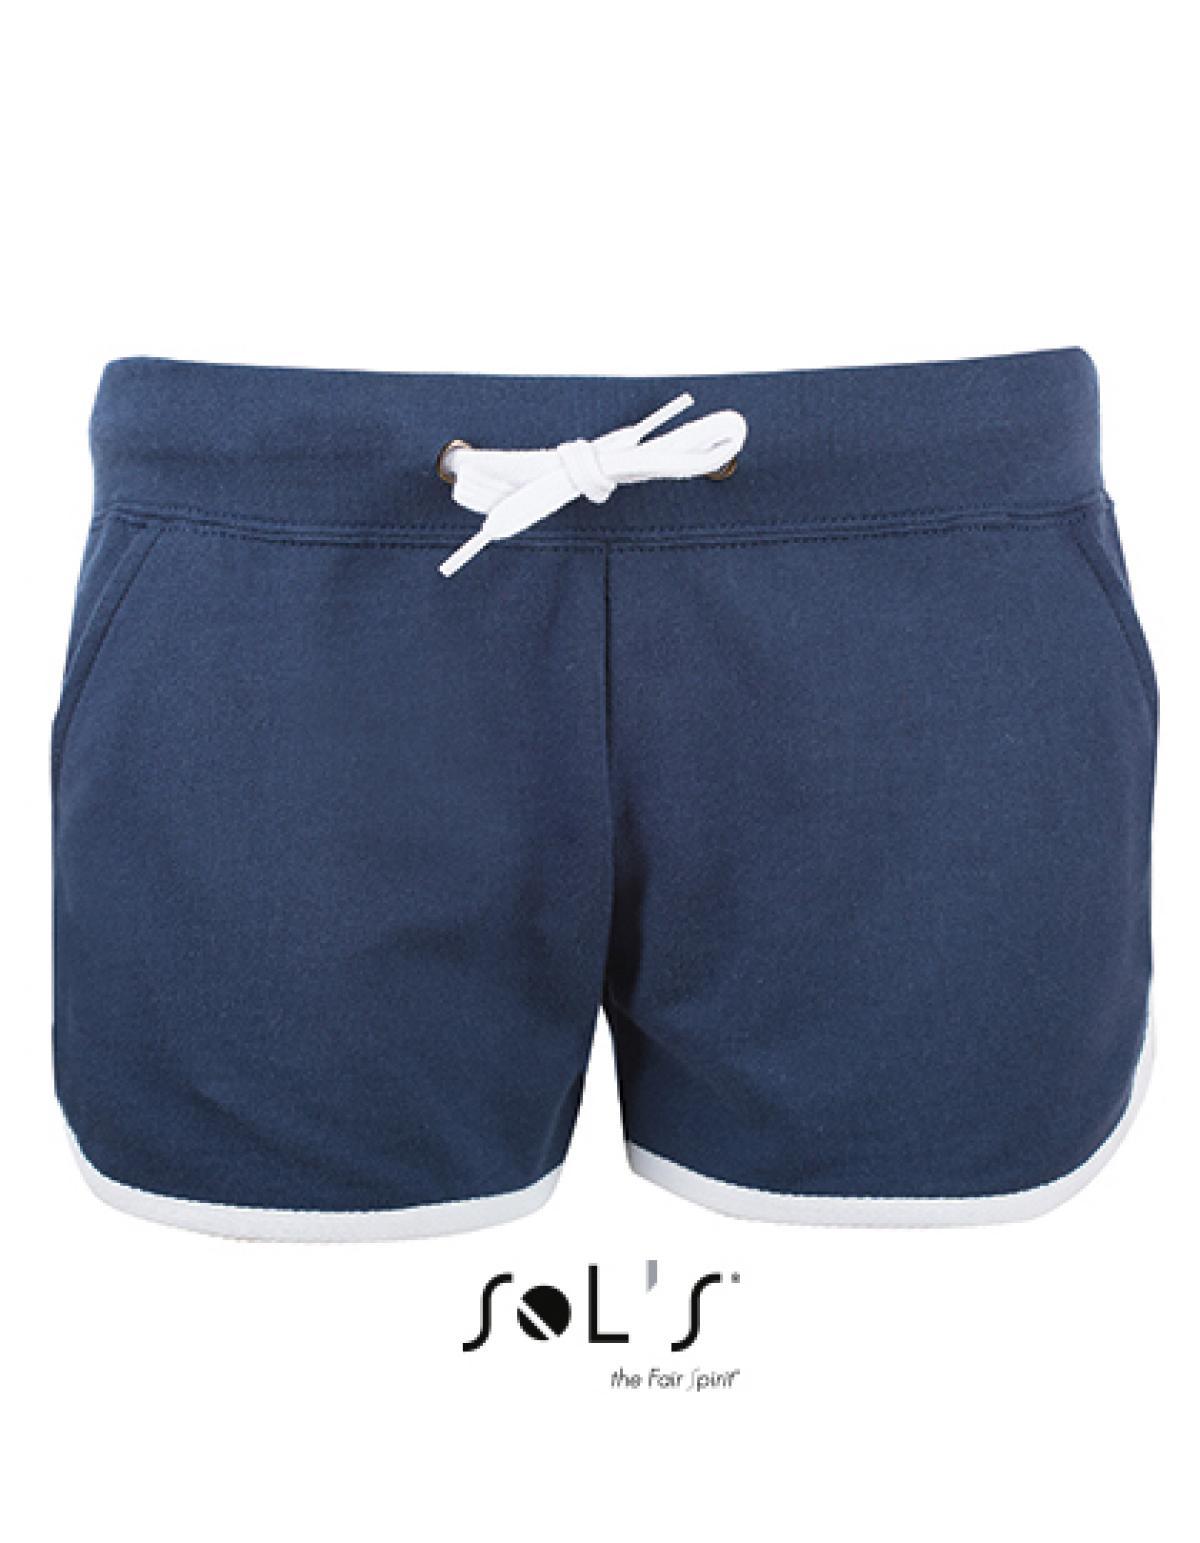 womens shorts juicy kurze damen sport hose rexlander s. Black Bedroom Furniture Sets. Home Design Ideas